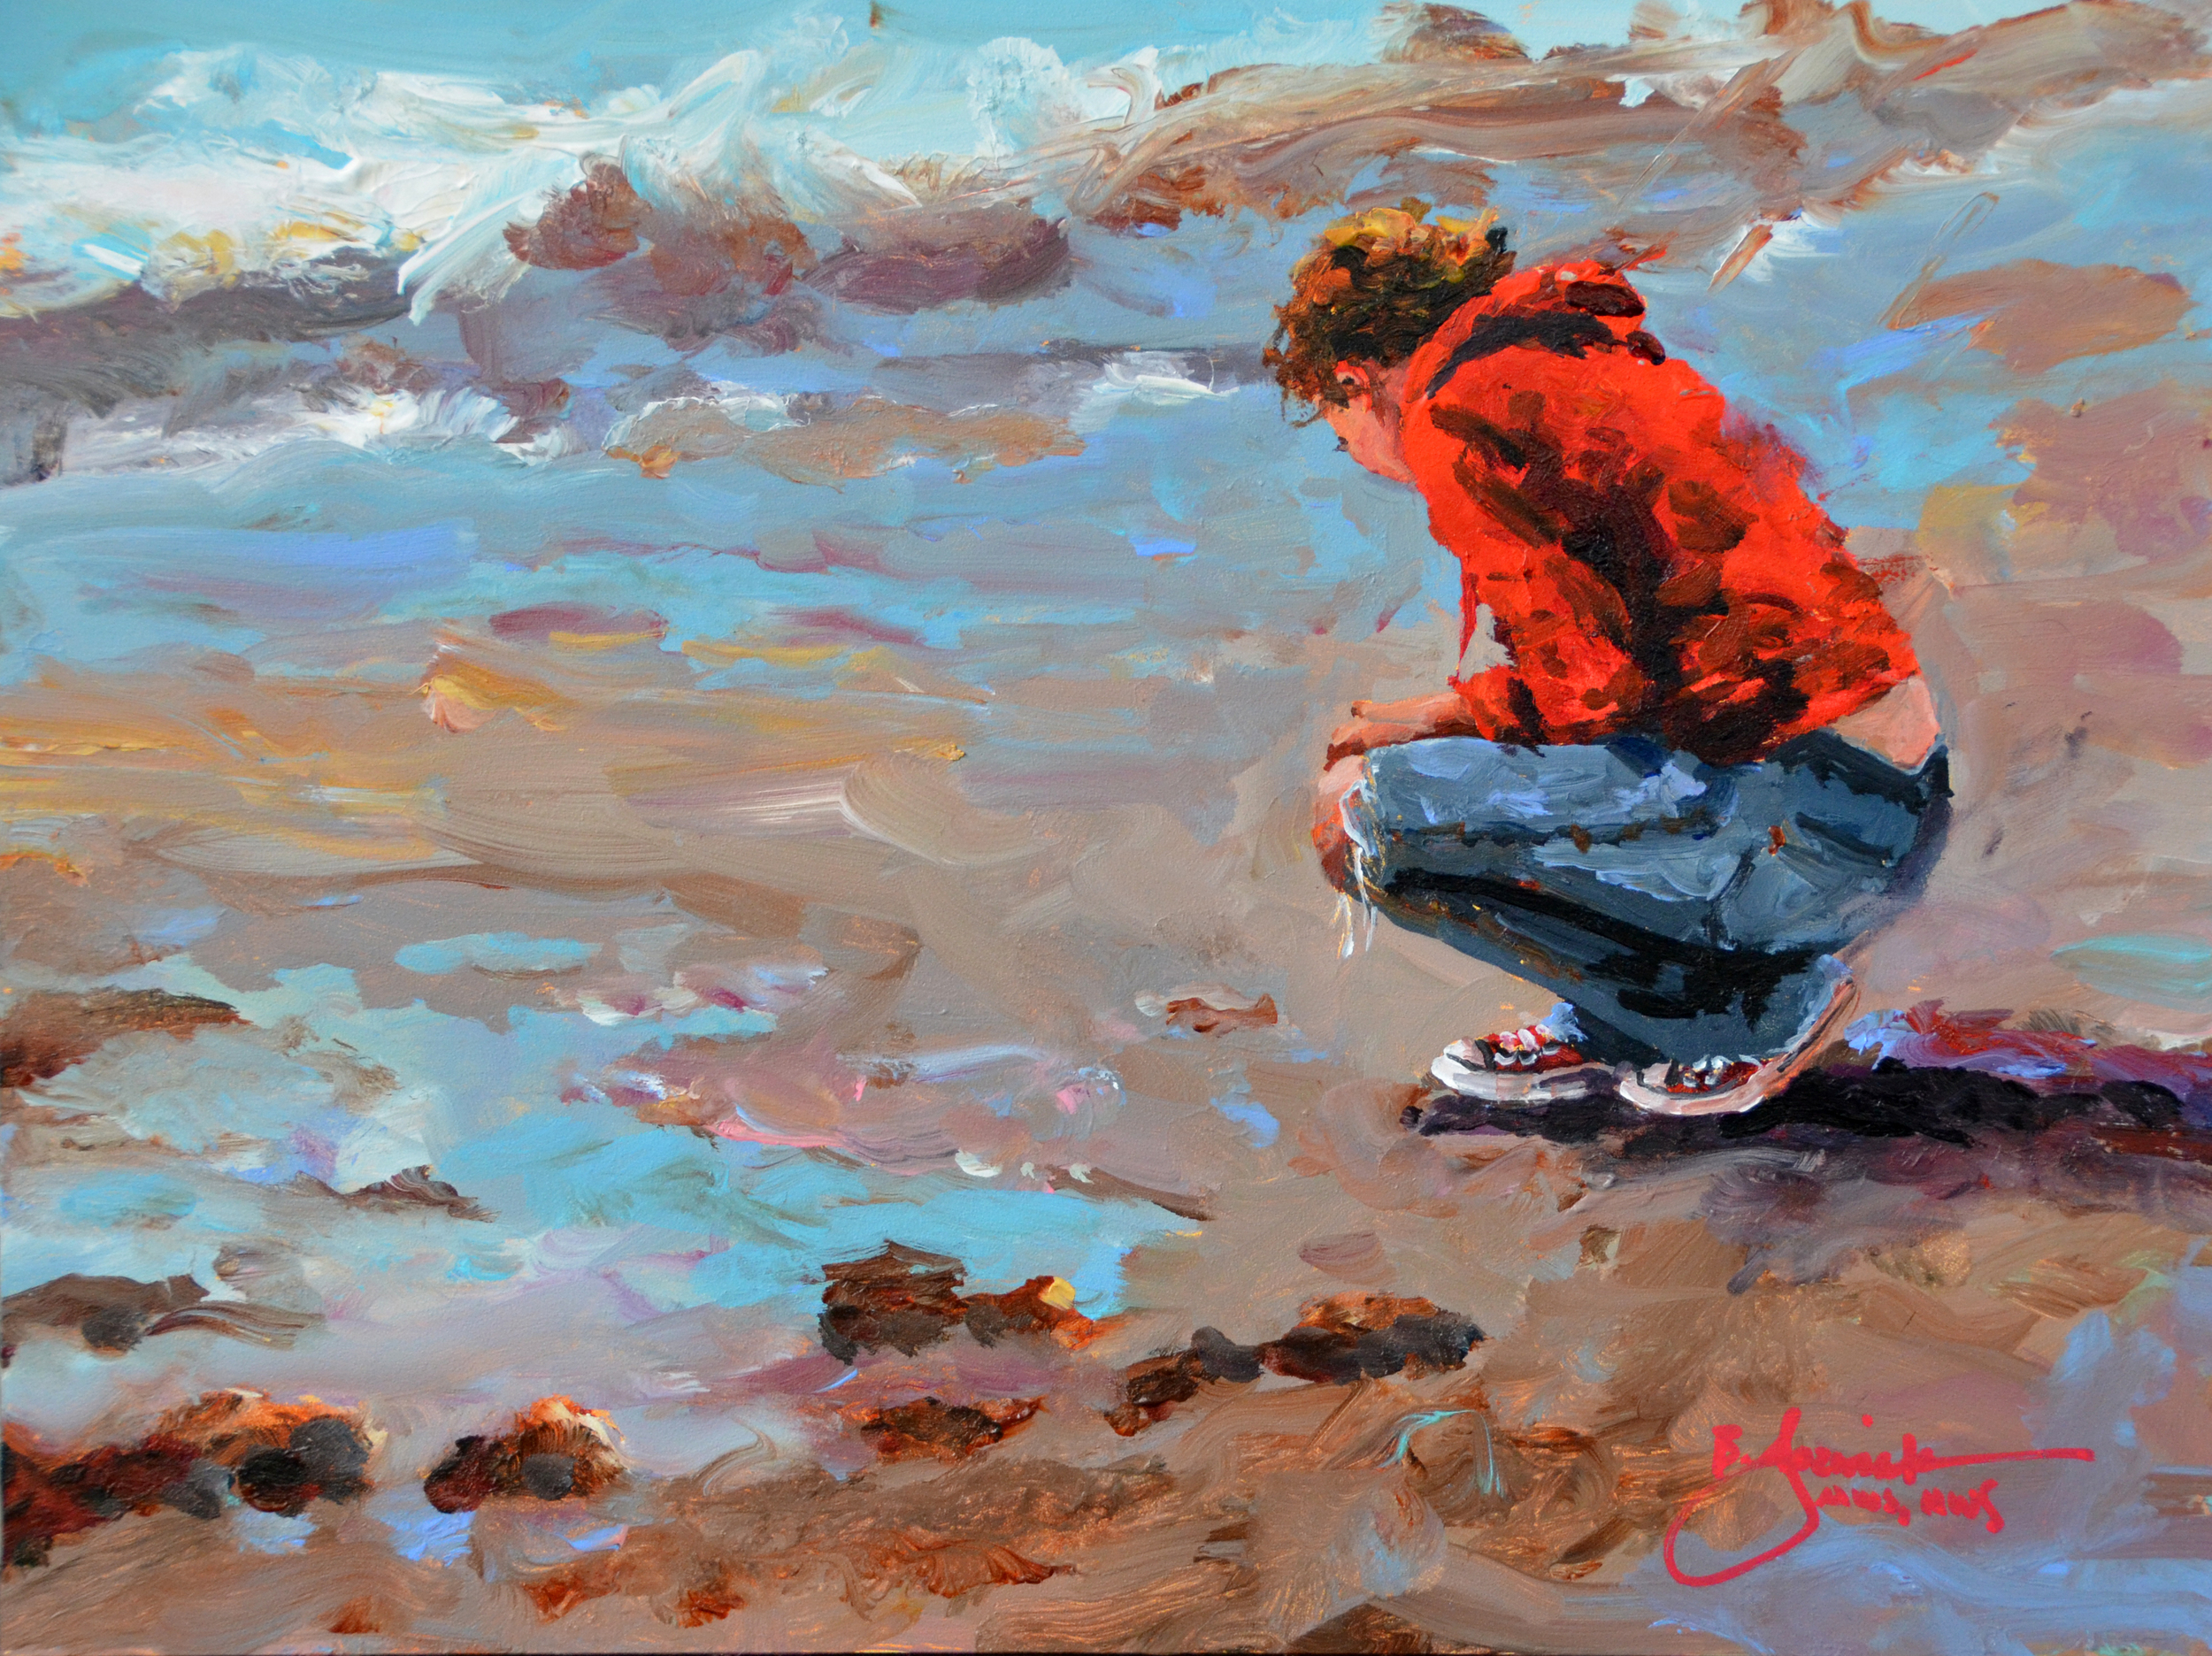 Bev Jozwiak_Seaside Treasures 9x12_acrylic.jpg